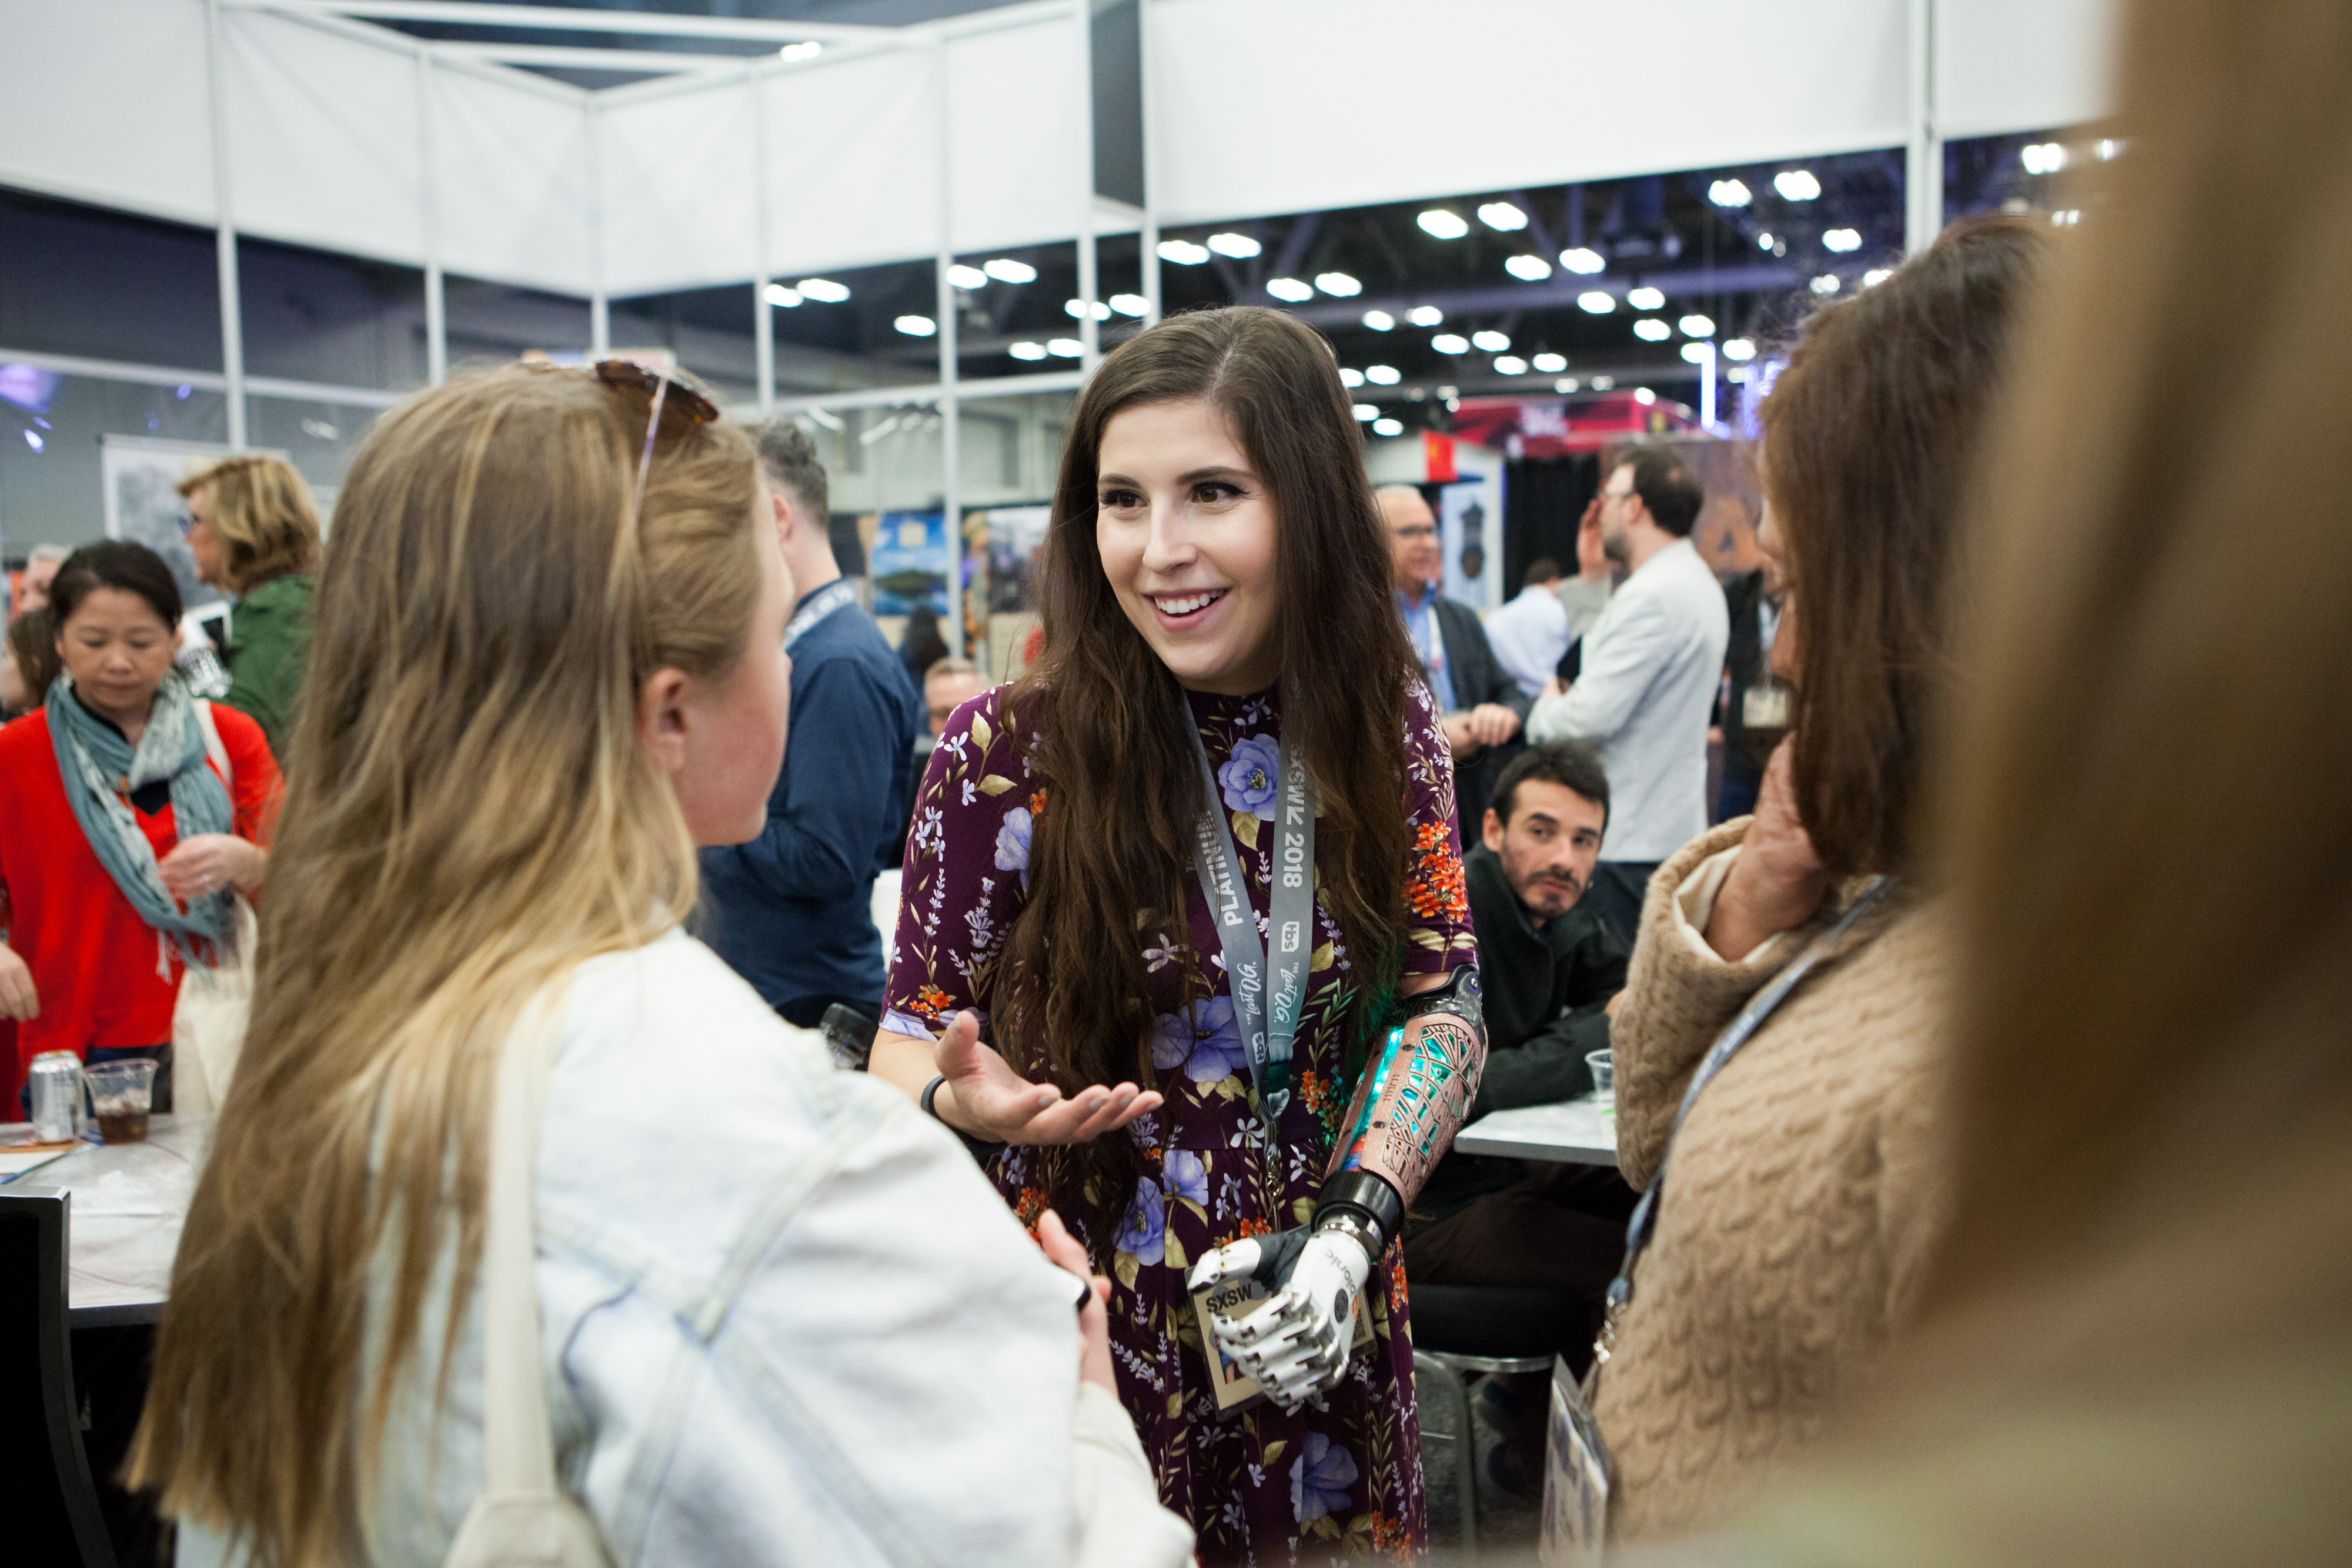 2018 SXSW Conference & Festivals | Photo by Samantha Burkardt